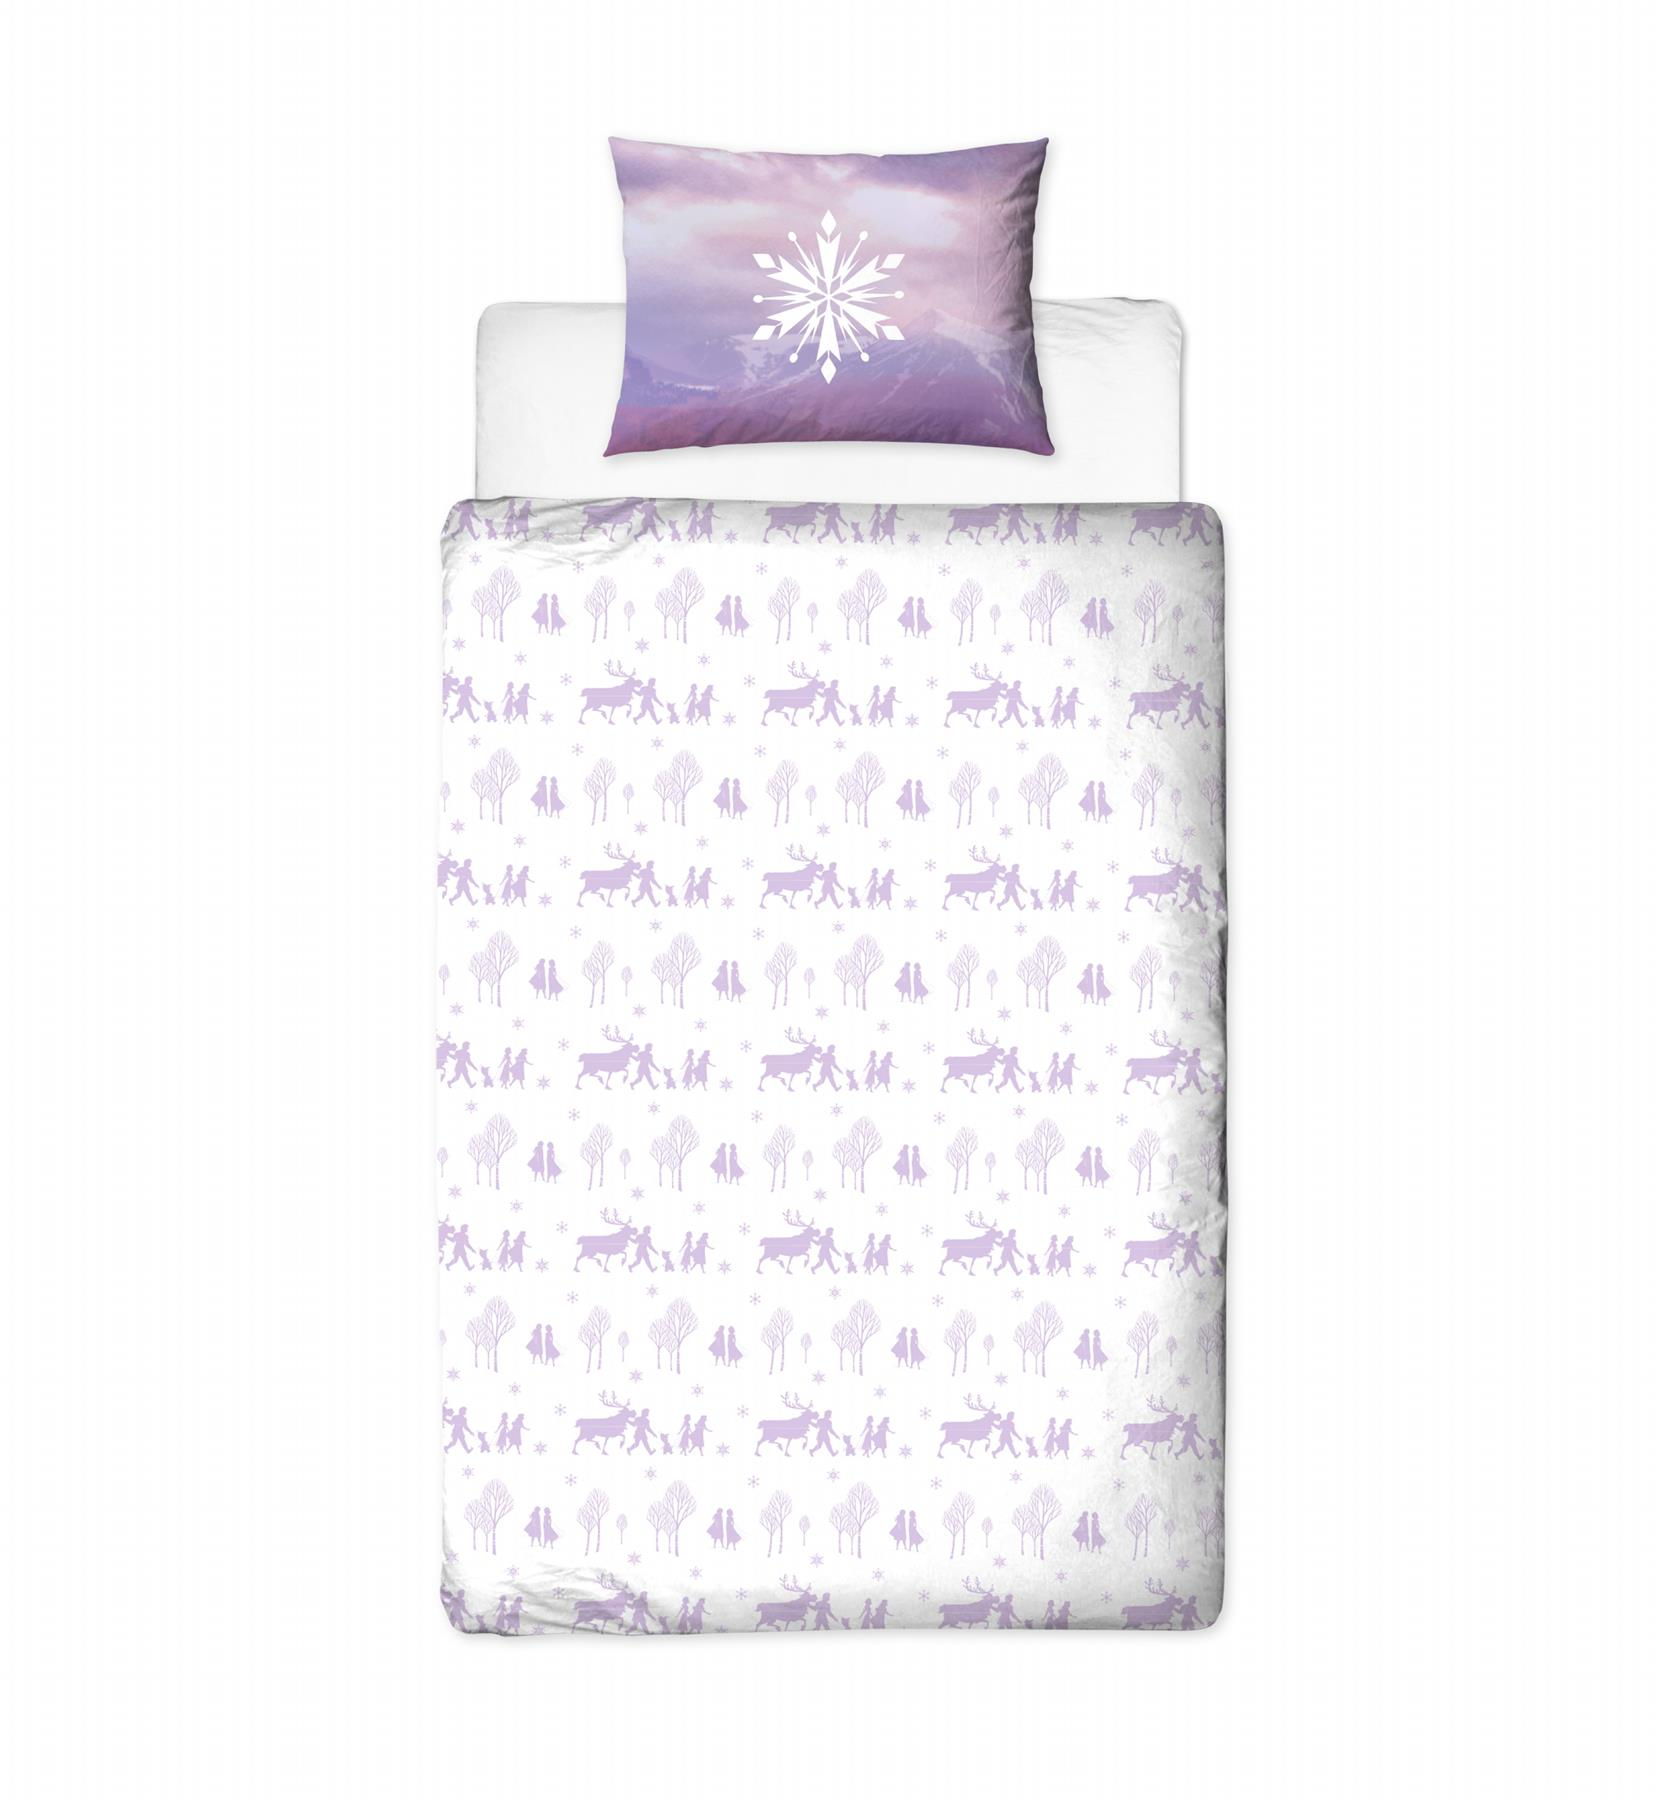 Official-Frozen-2-Duvet-Covers-Single-Double-Reversible-Bedding-Elsa-Anna-Olaf thumbnail 17